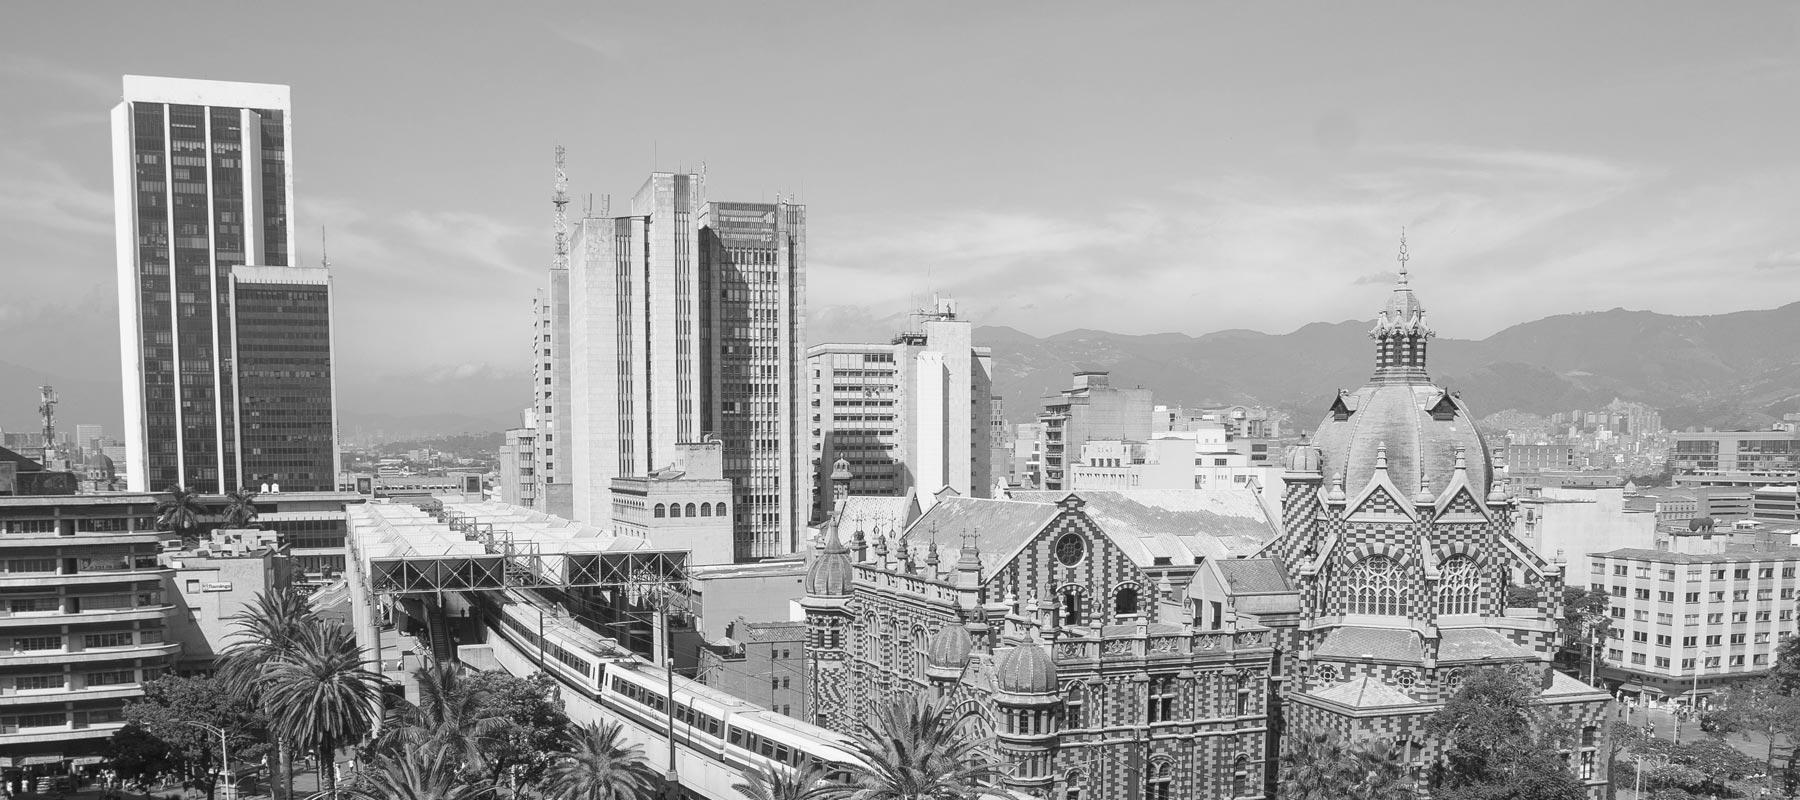 Medellin, Columbia - Ubidots